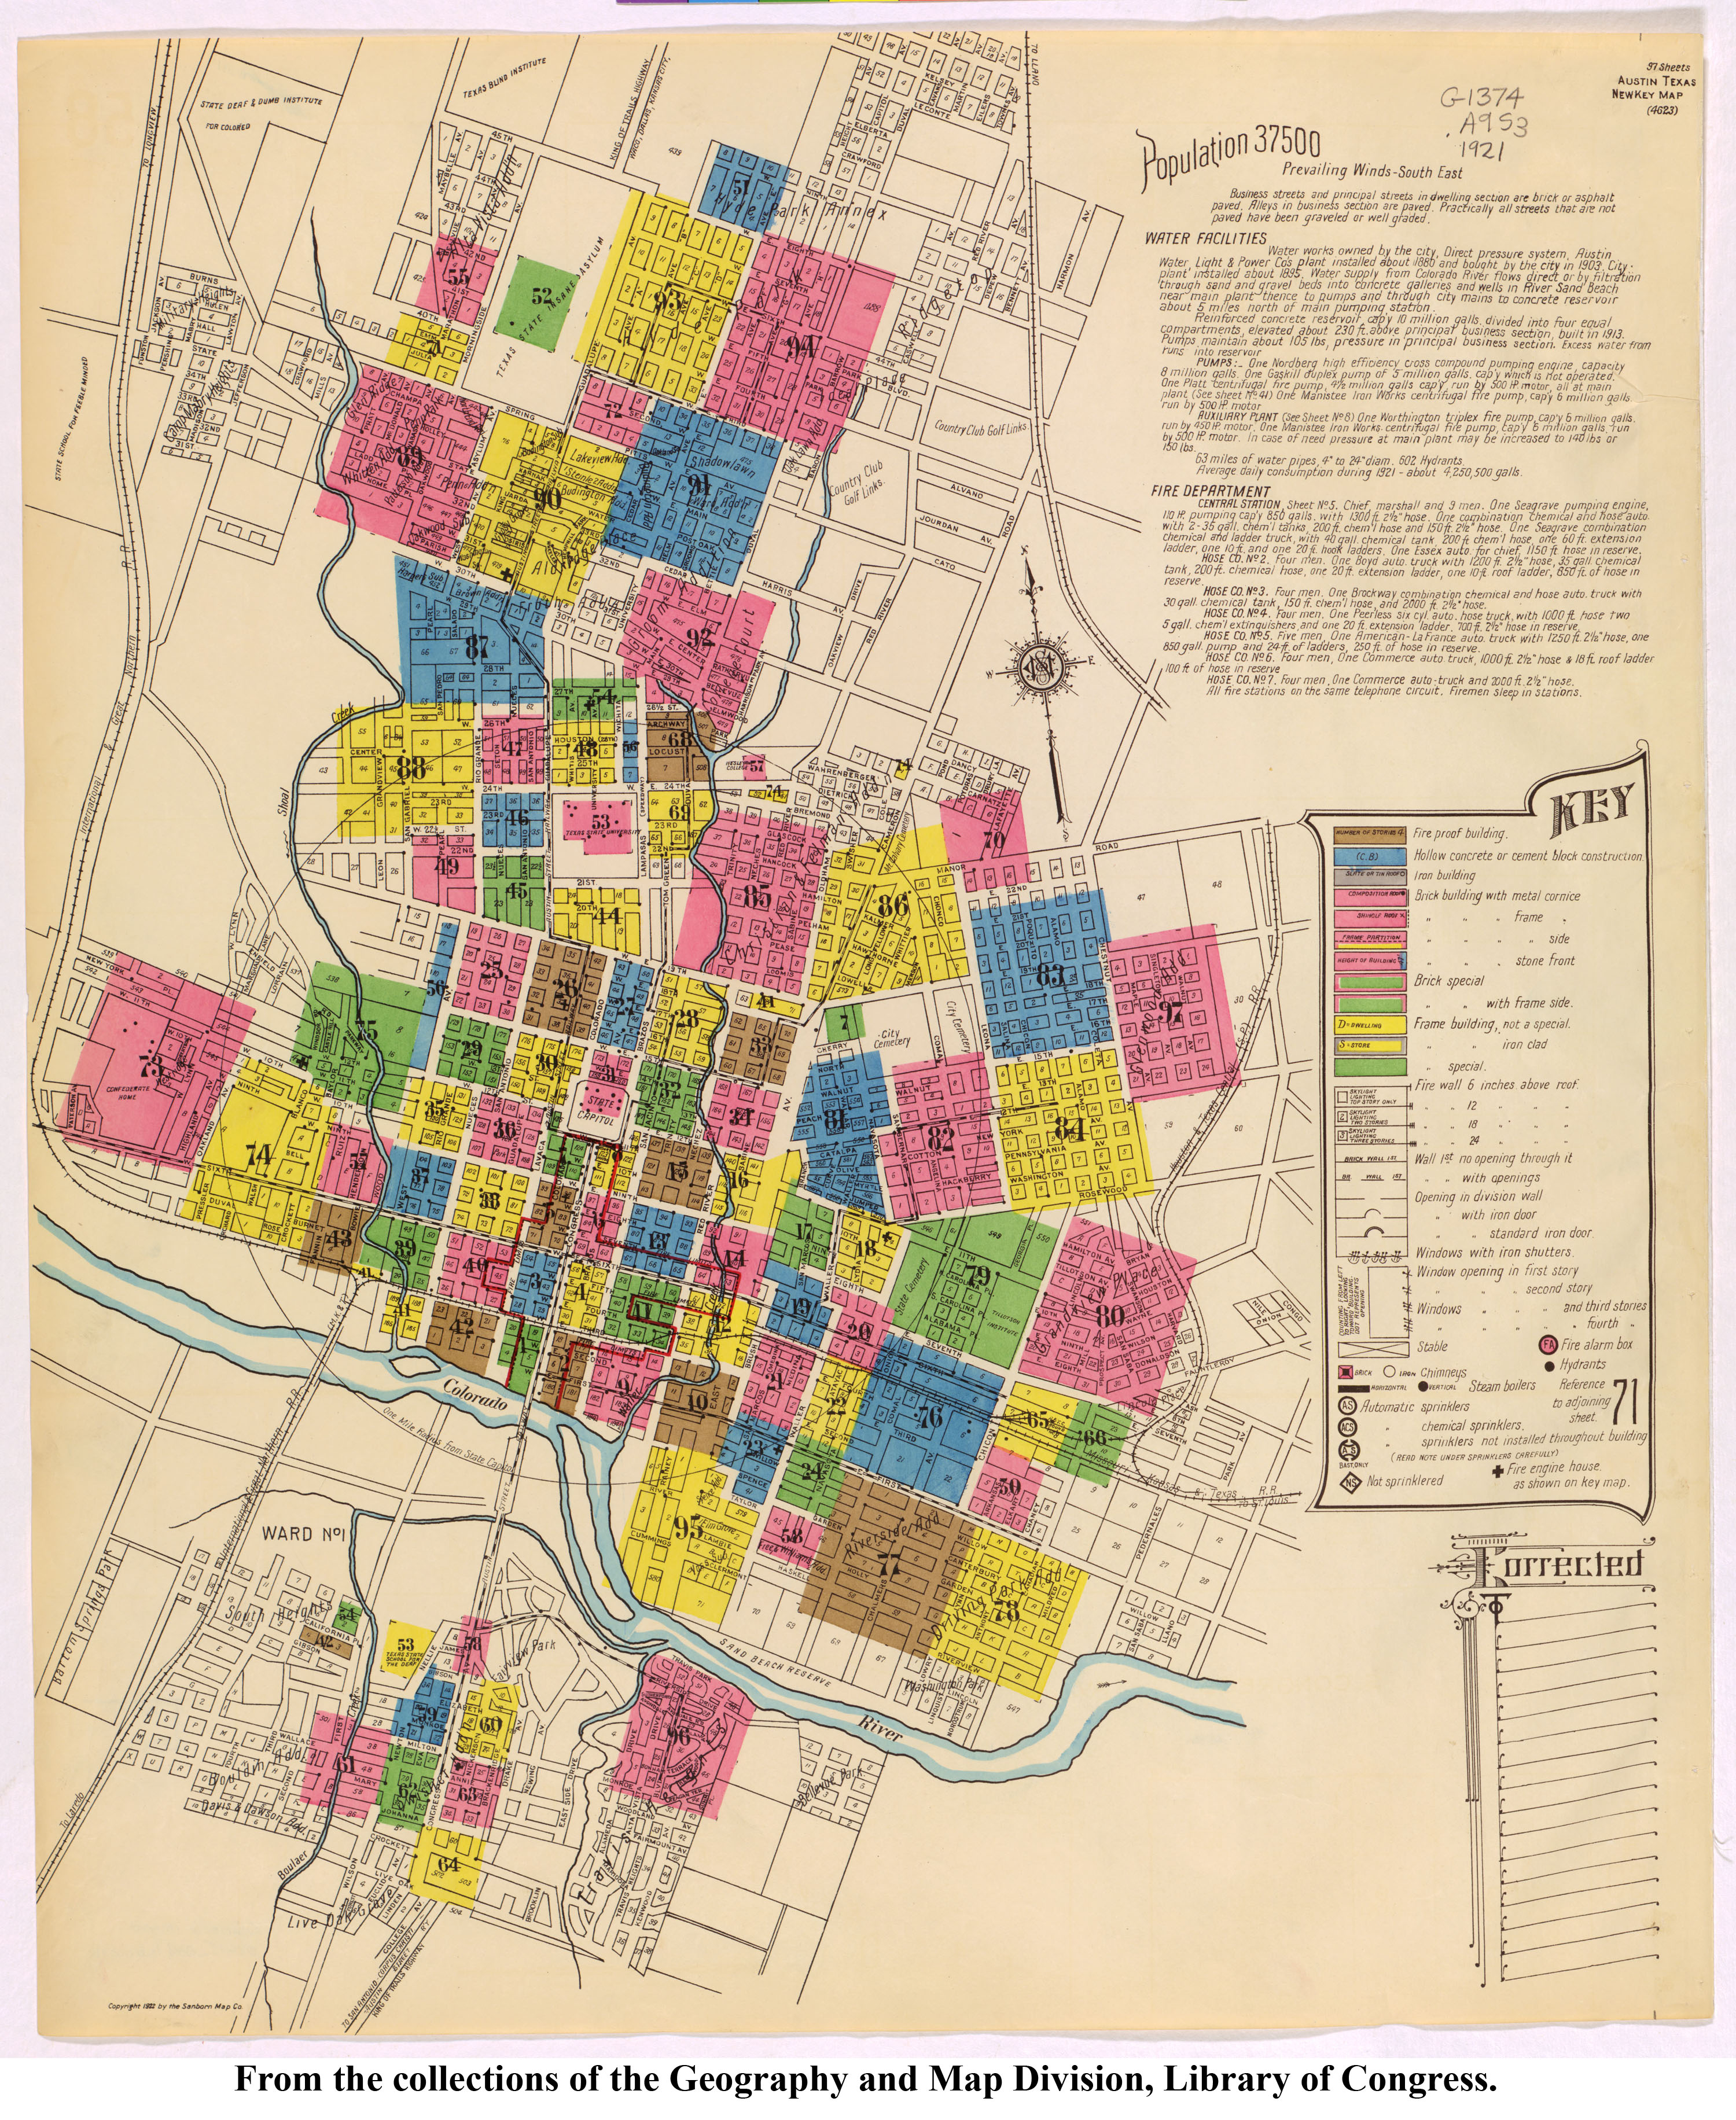 Historical Maps Of Austin Bryker Woods Neighborhood - Georgia map 1921